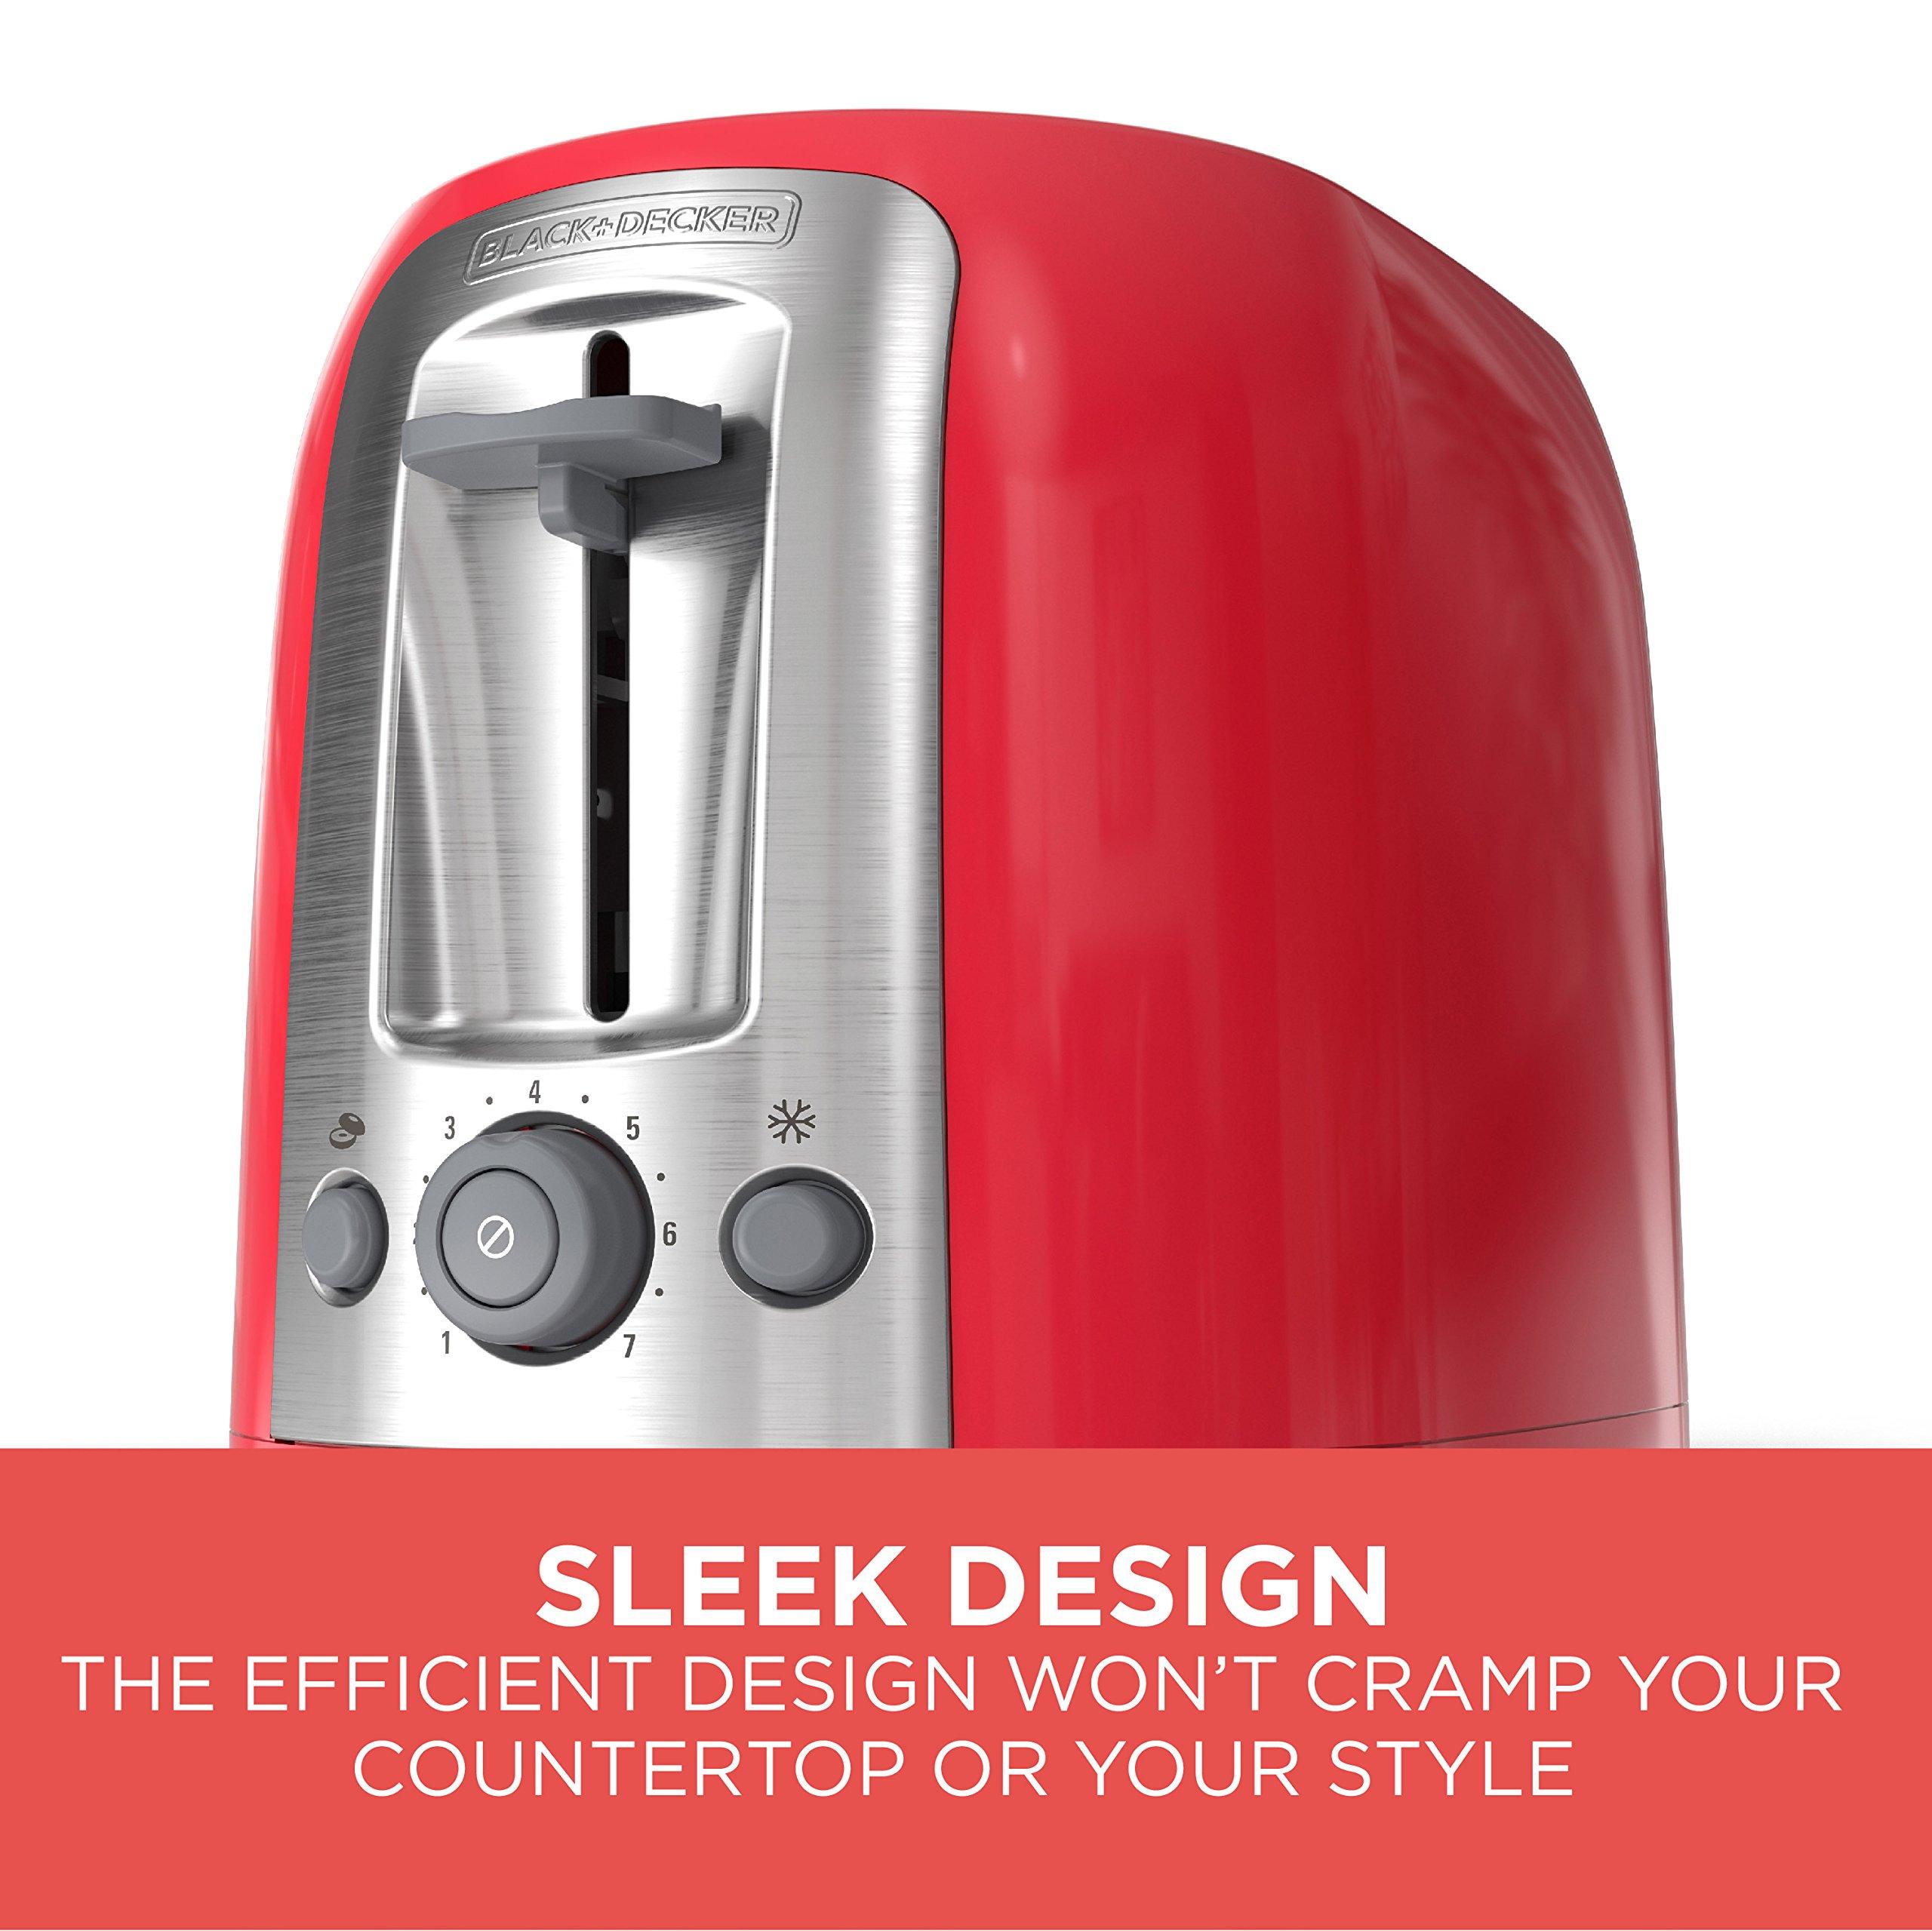 BLACK+DECKER 2-Slice Toaster, Red, TR1278RM by BLACK+DECKER (Image #4)